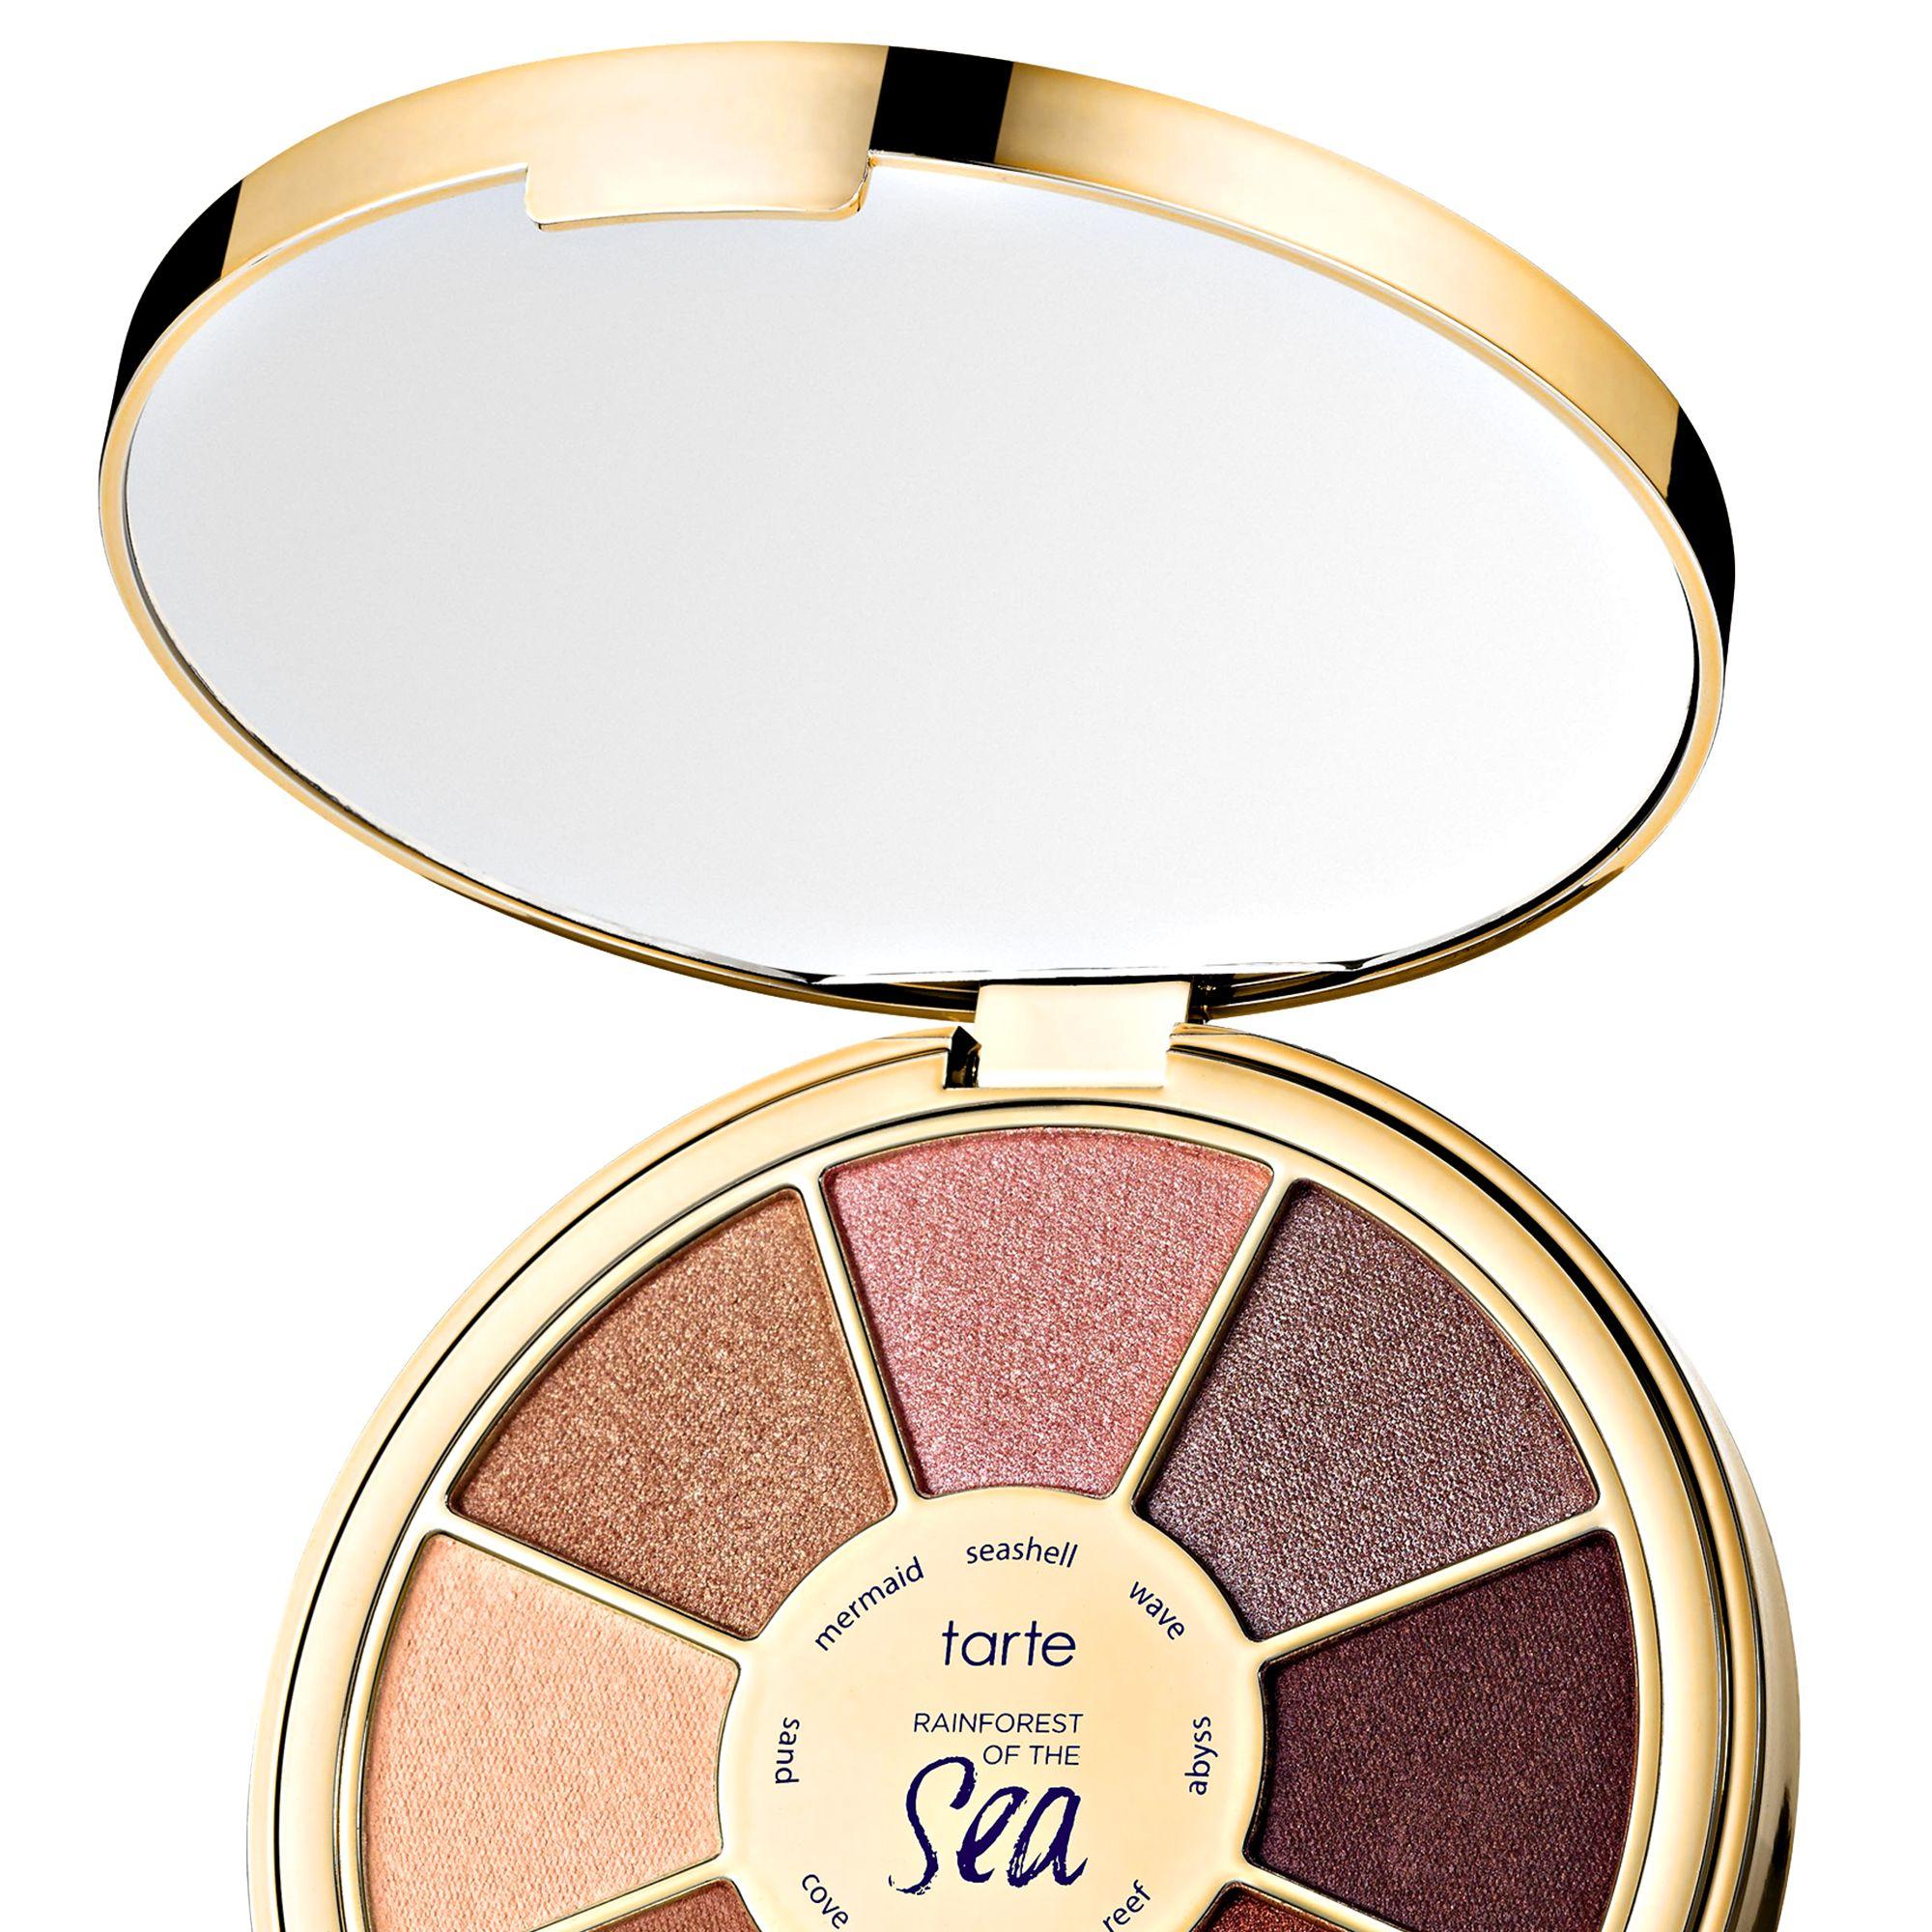 "<p><strong>Tarte</strong> Rainforest of the Sea Eyeshadow Palette, $34, <a href=""http://www.sephora.com/"" target=""_blank"">sephora.com</a>.</p>"